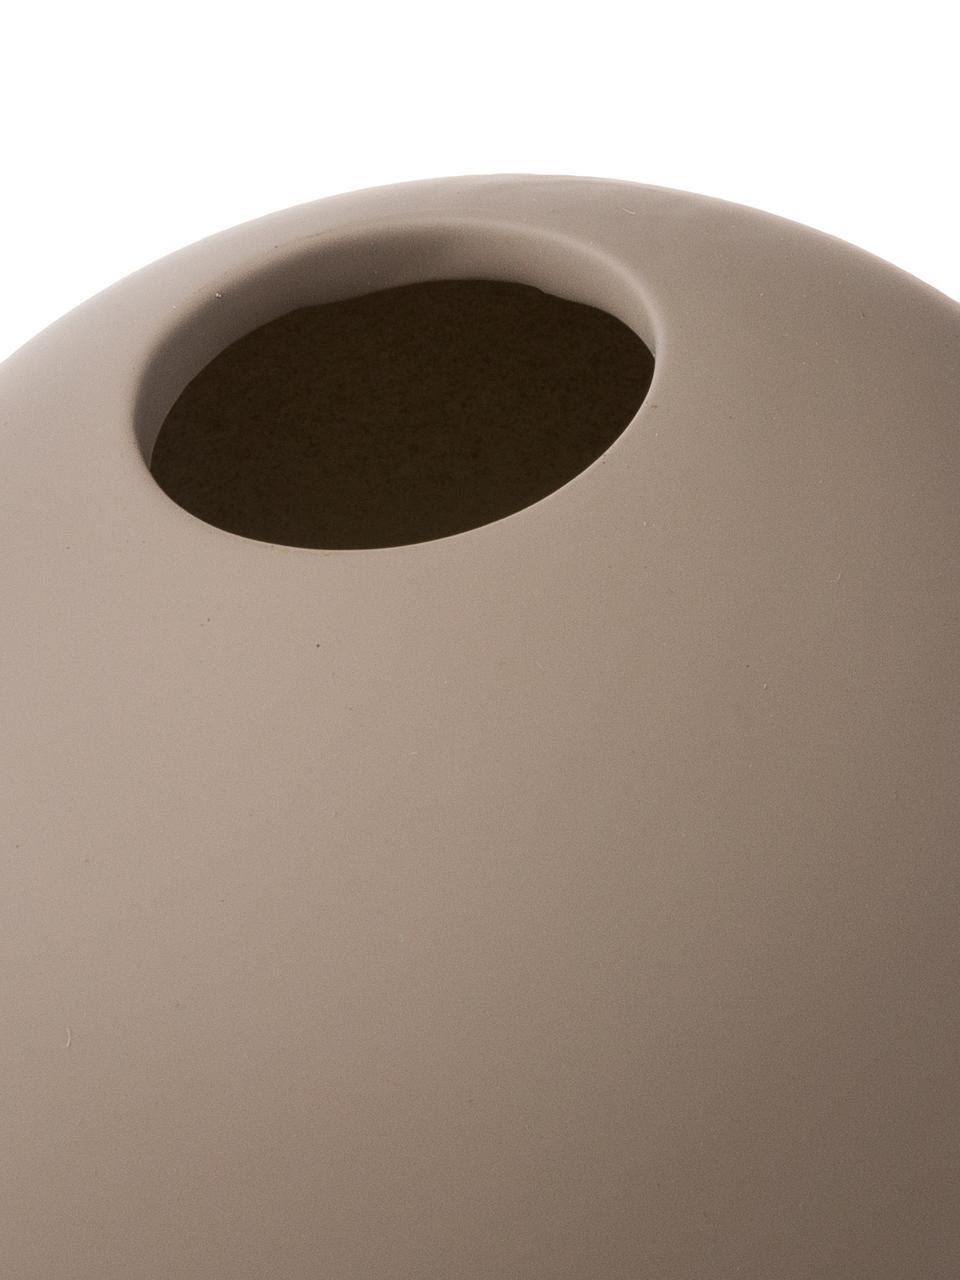 Handgefertigte Kugel-Vase Ball, Keramik, Taupe, Ø 20 x H 20 cm